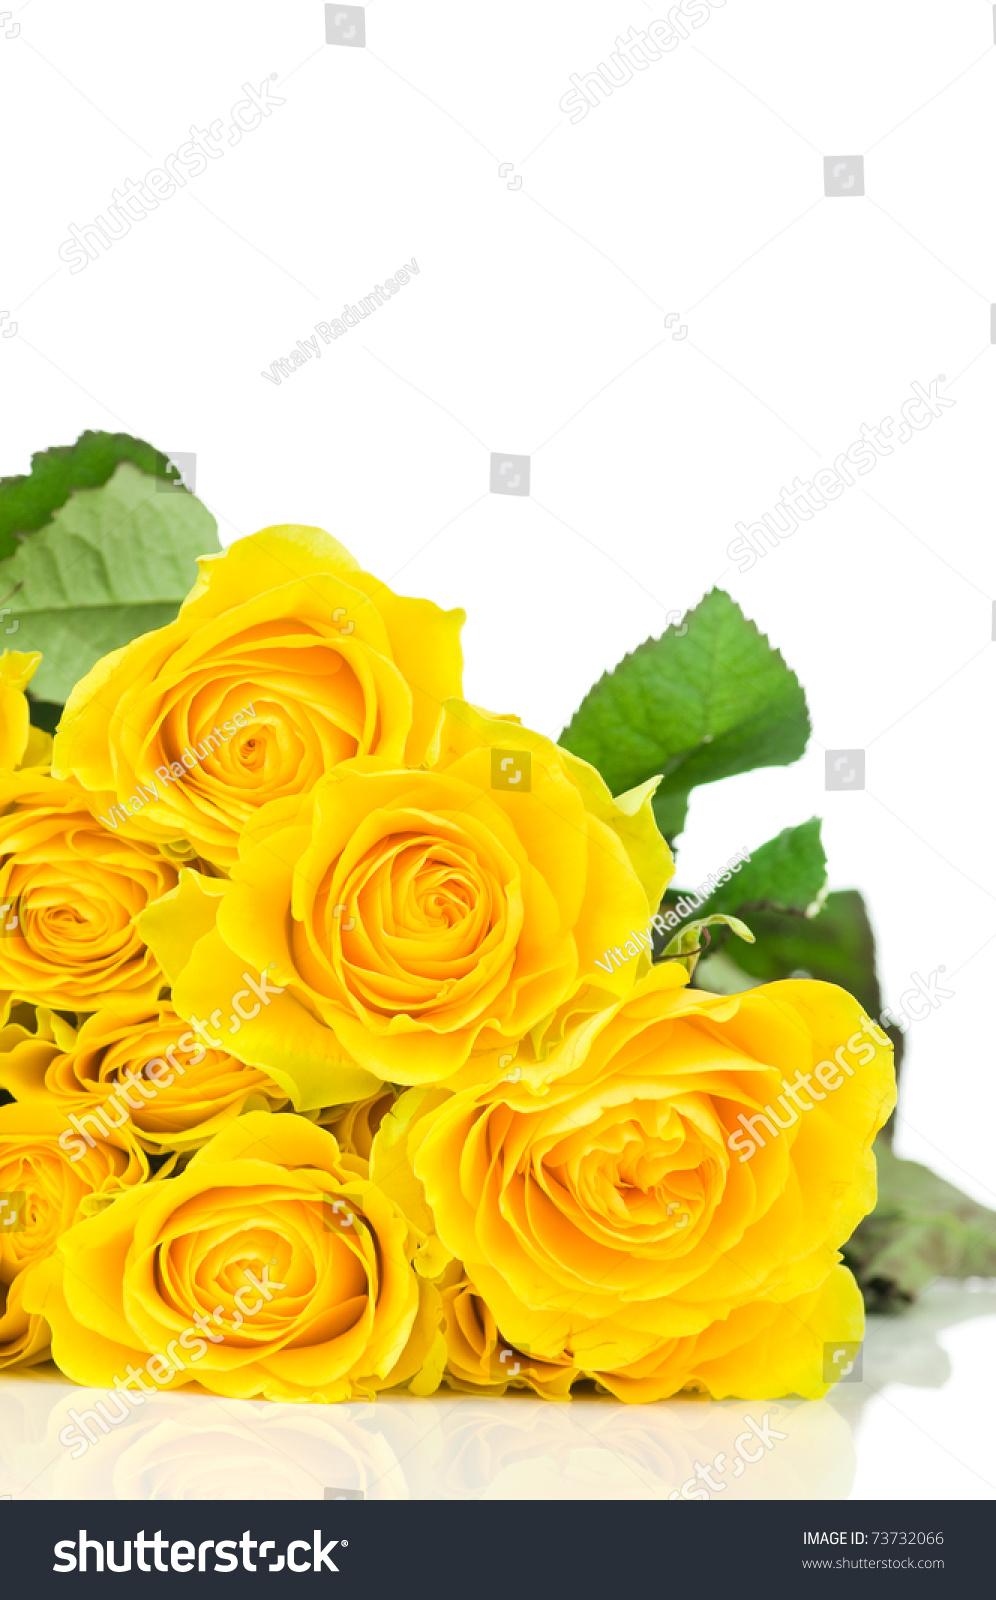 yellow roses isolated on white background stock photo